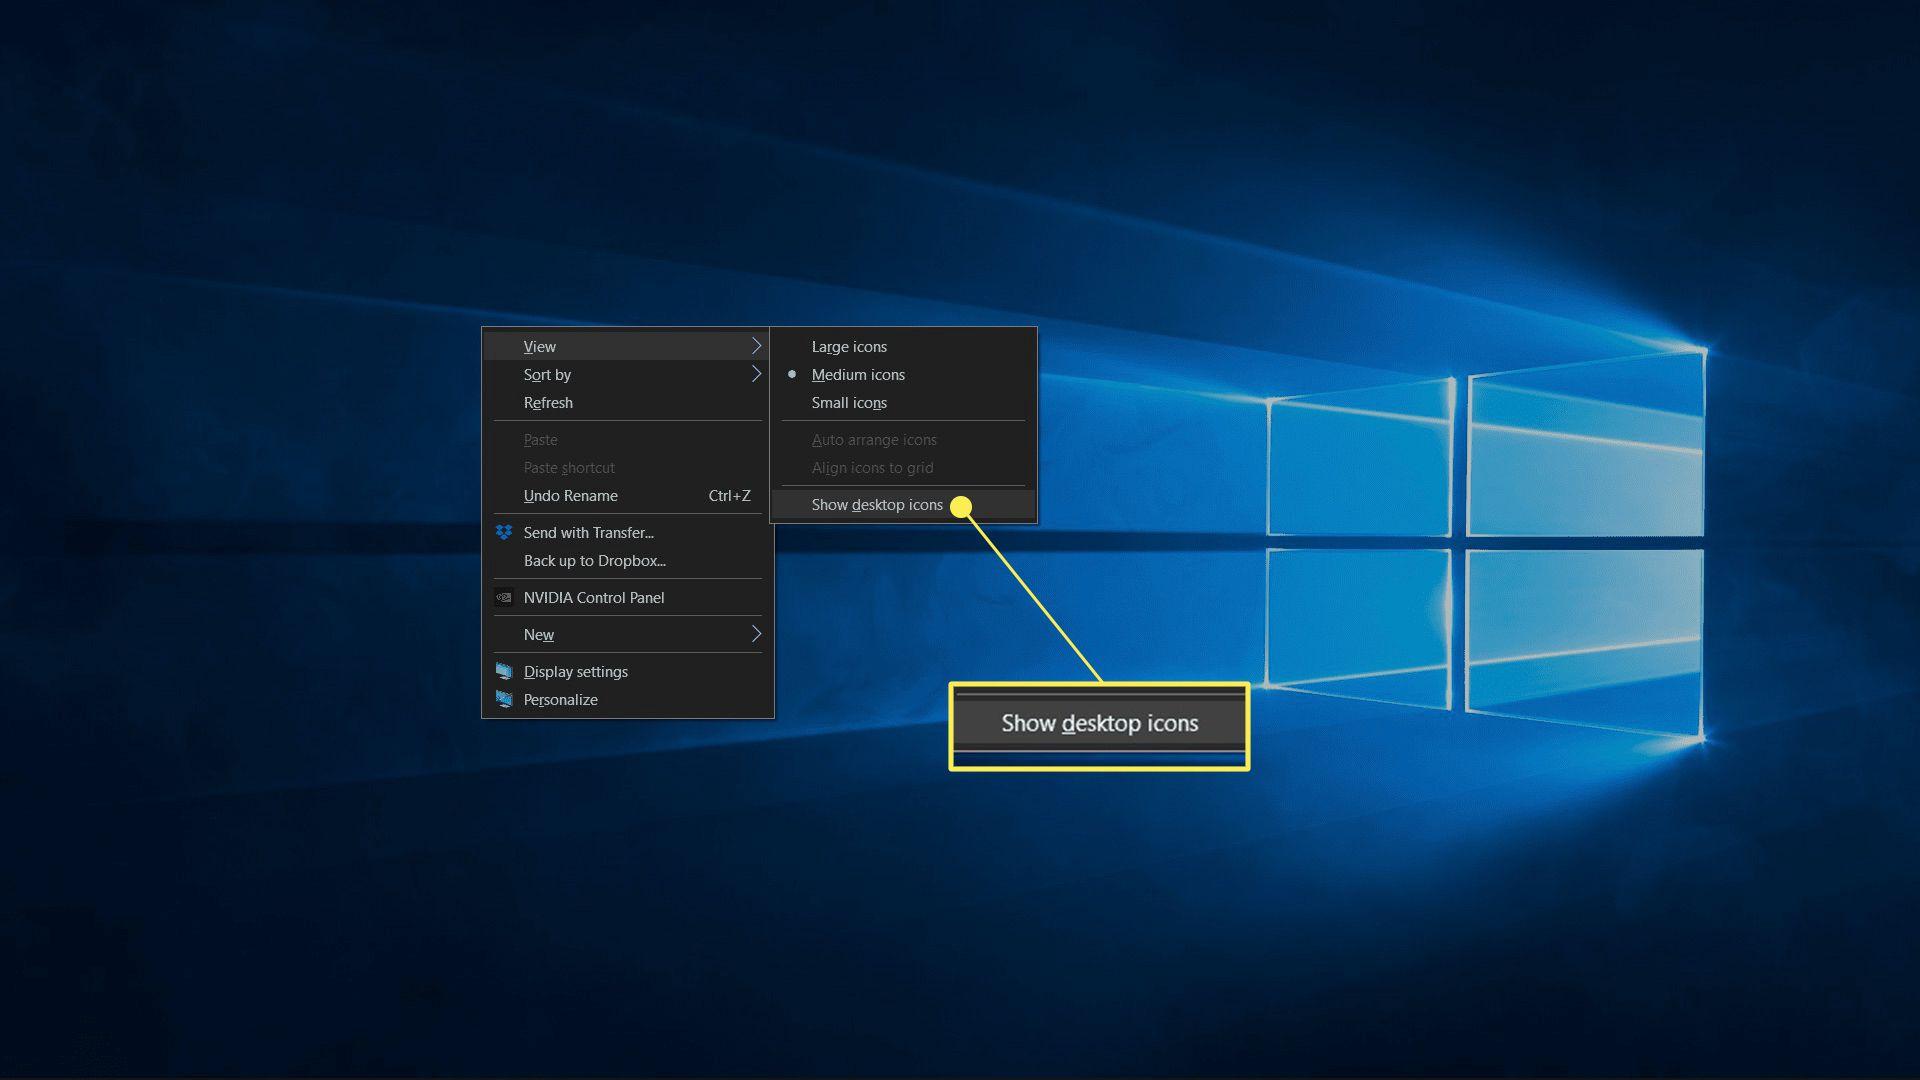 Show desktop icons highlighted in the desktop context menu.